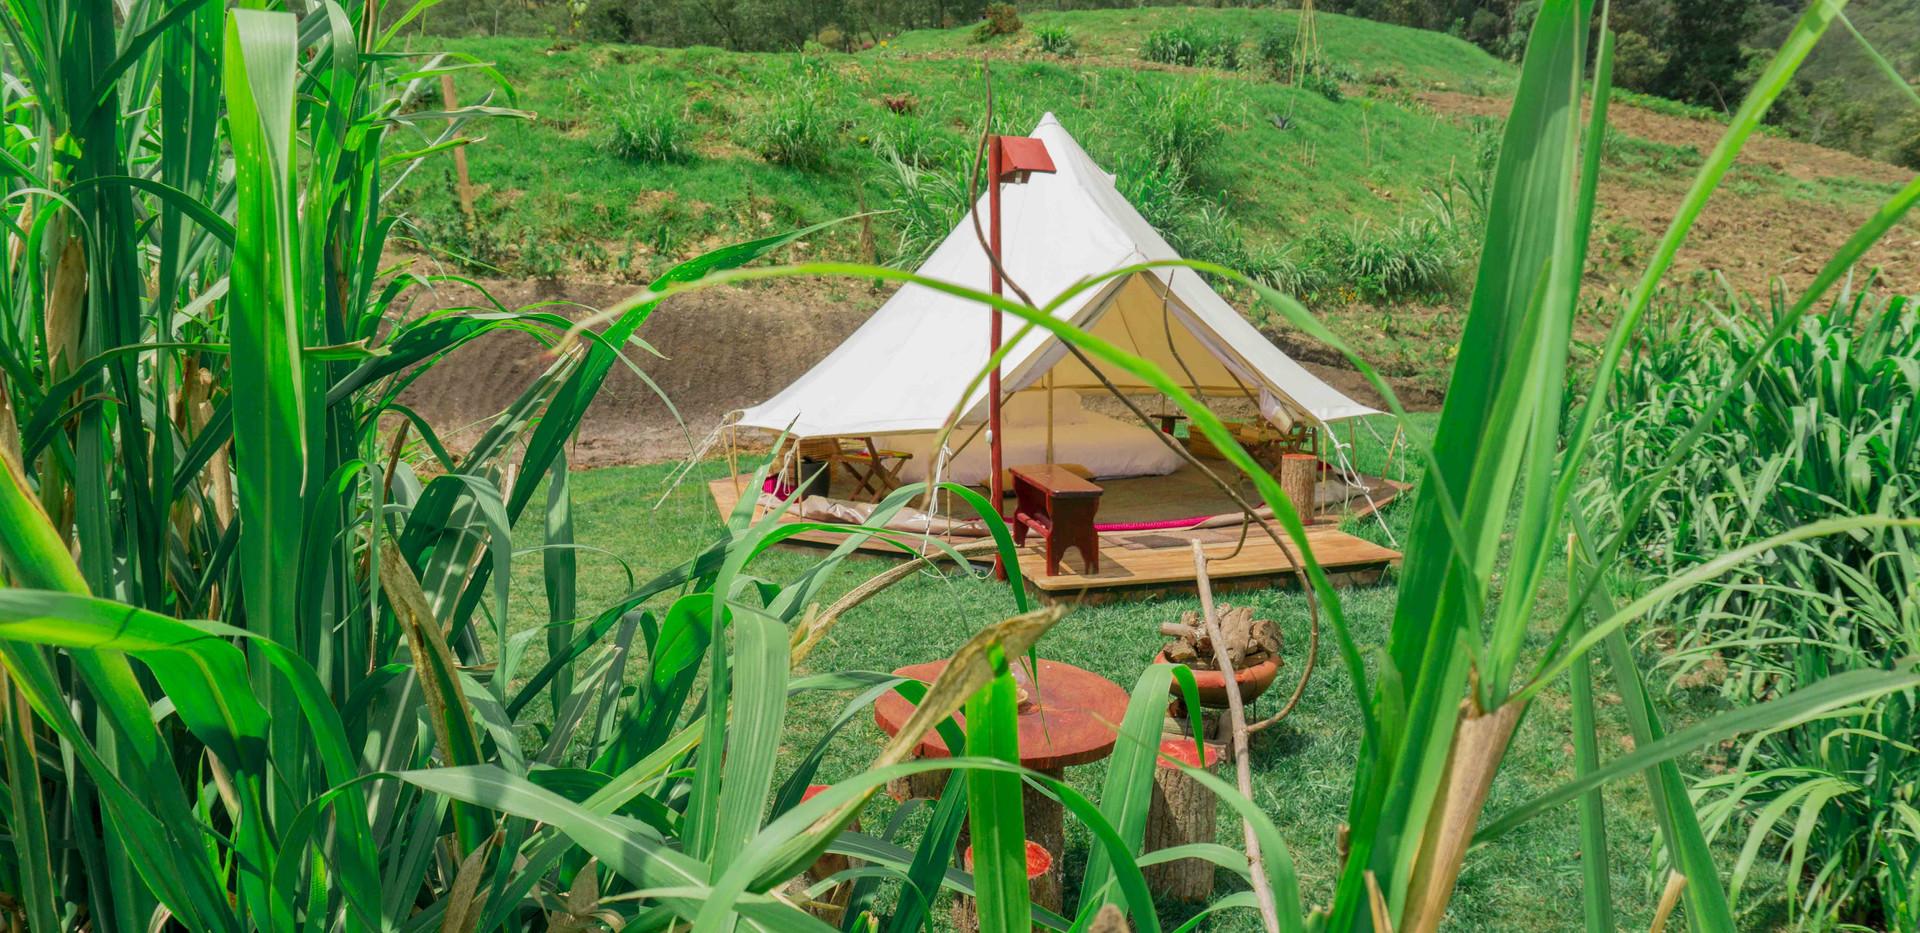 Cedron Glamping Tent Finca Corazon.jpg